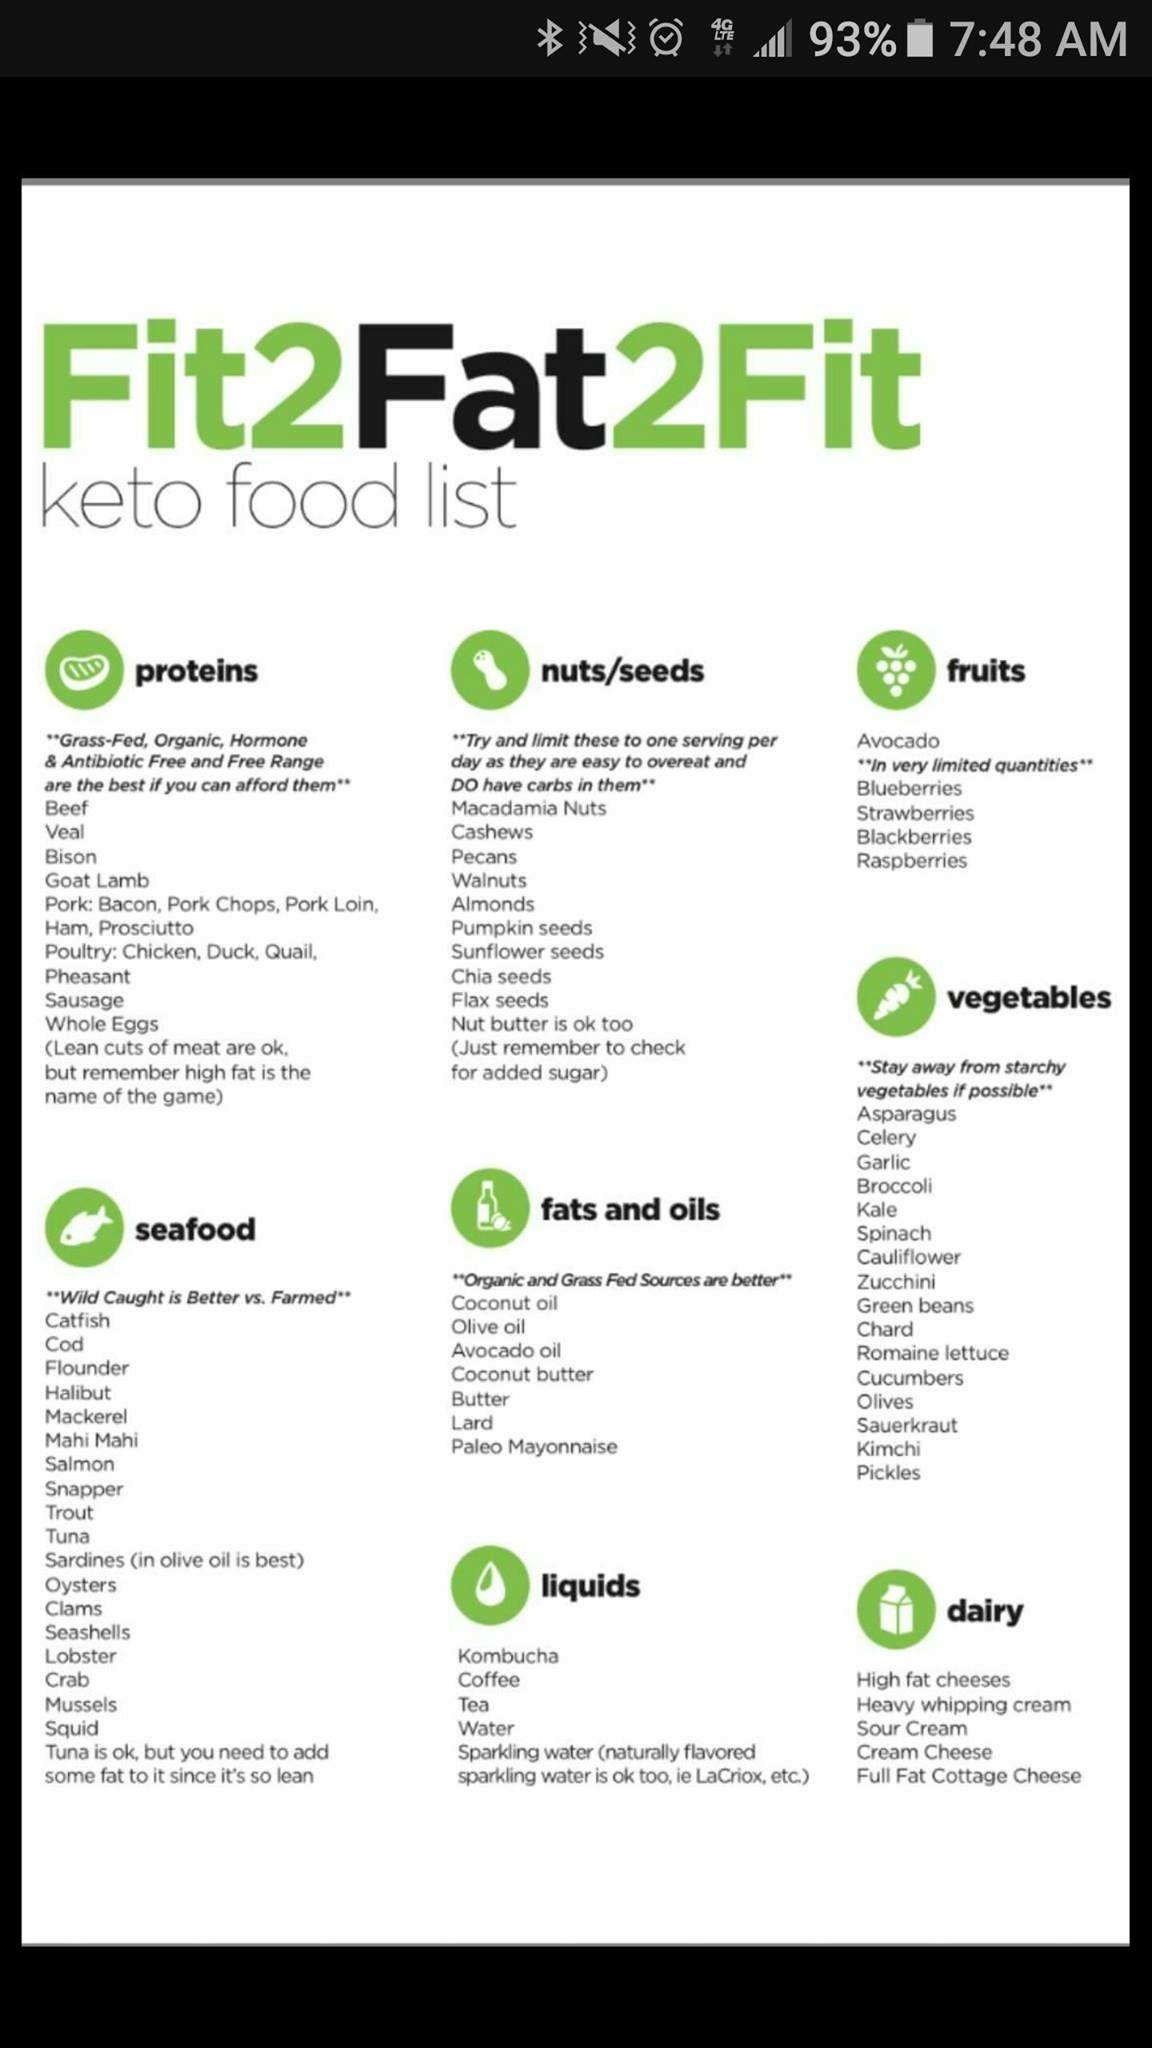 Printable Fit2fat2fit Keto Meal Plan Pdf